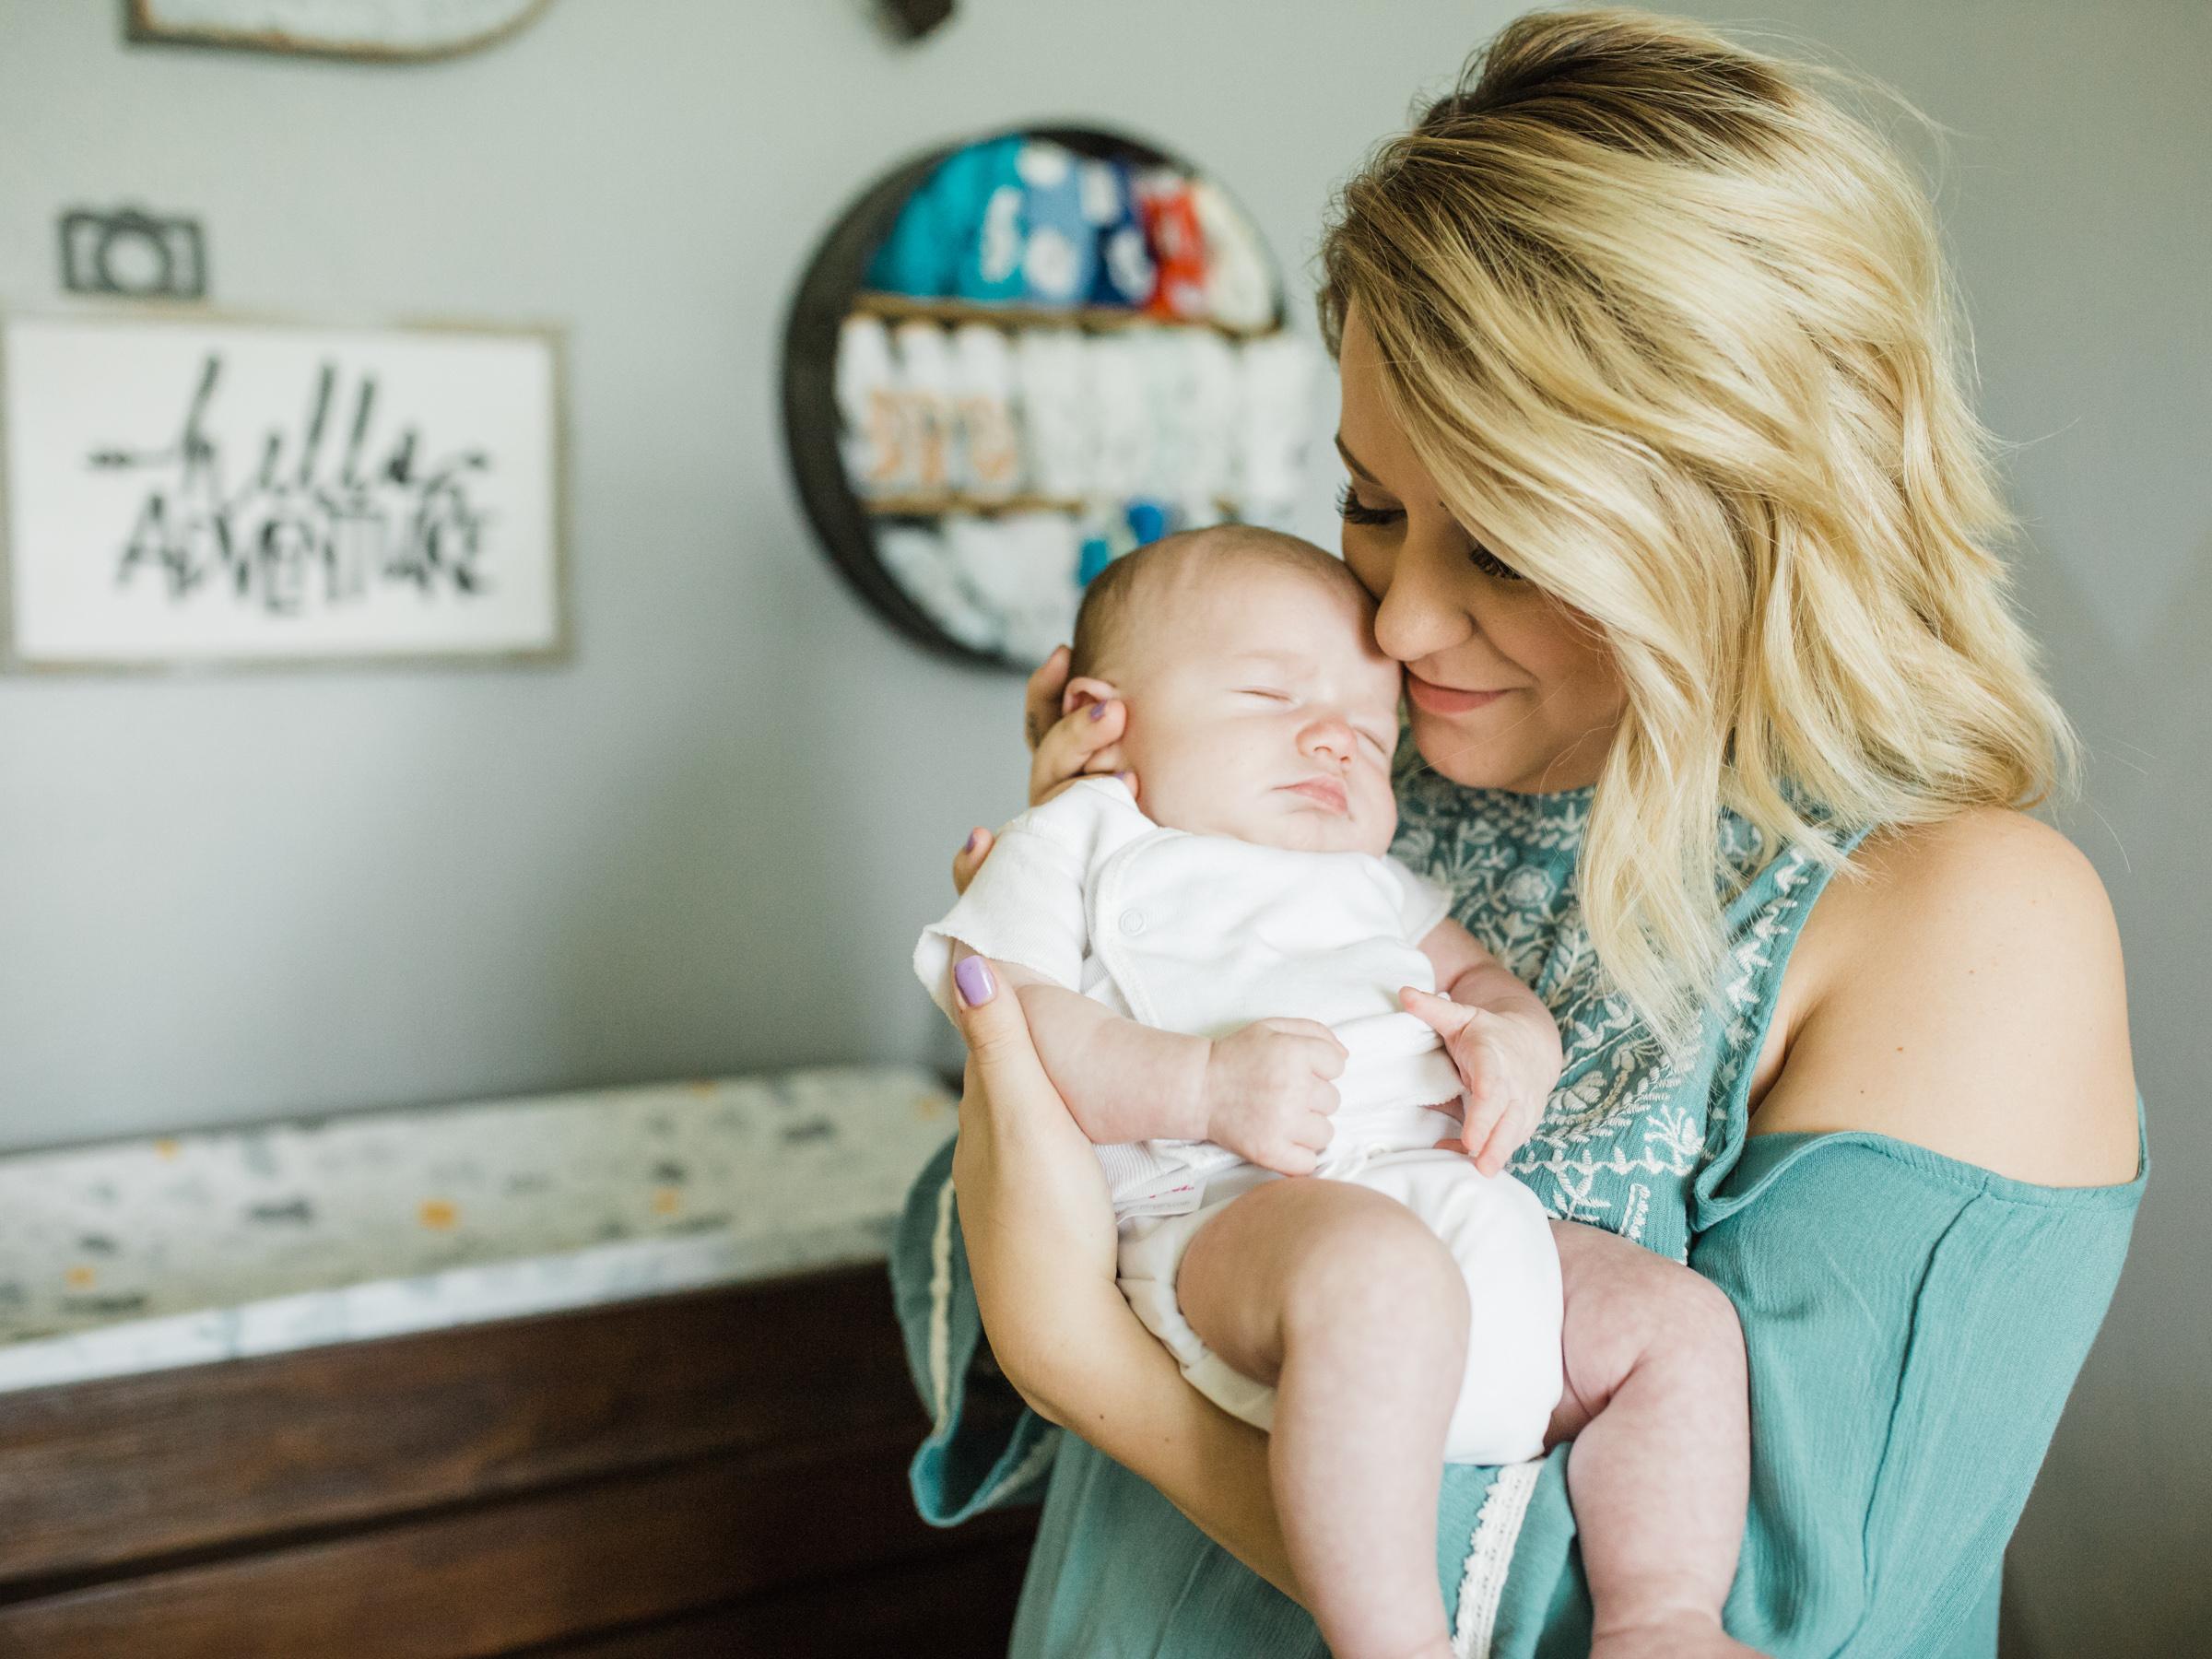 Jameson Boone | Newborn Lifestyle Session | Texas Portrait Photographer | Cute Baby Boy Nursery | Newborn Photos | Britni Dean Photography | britnidean.com